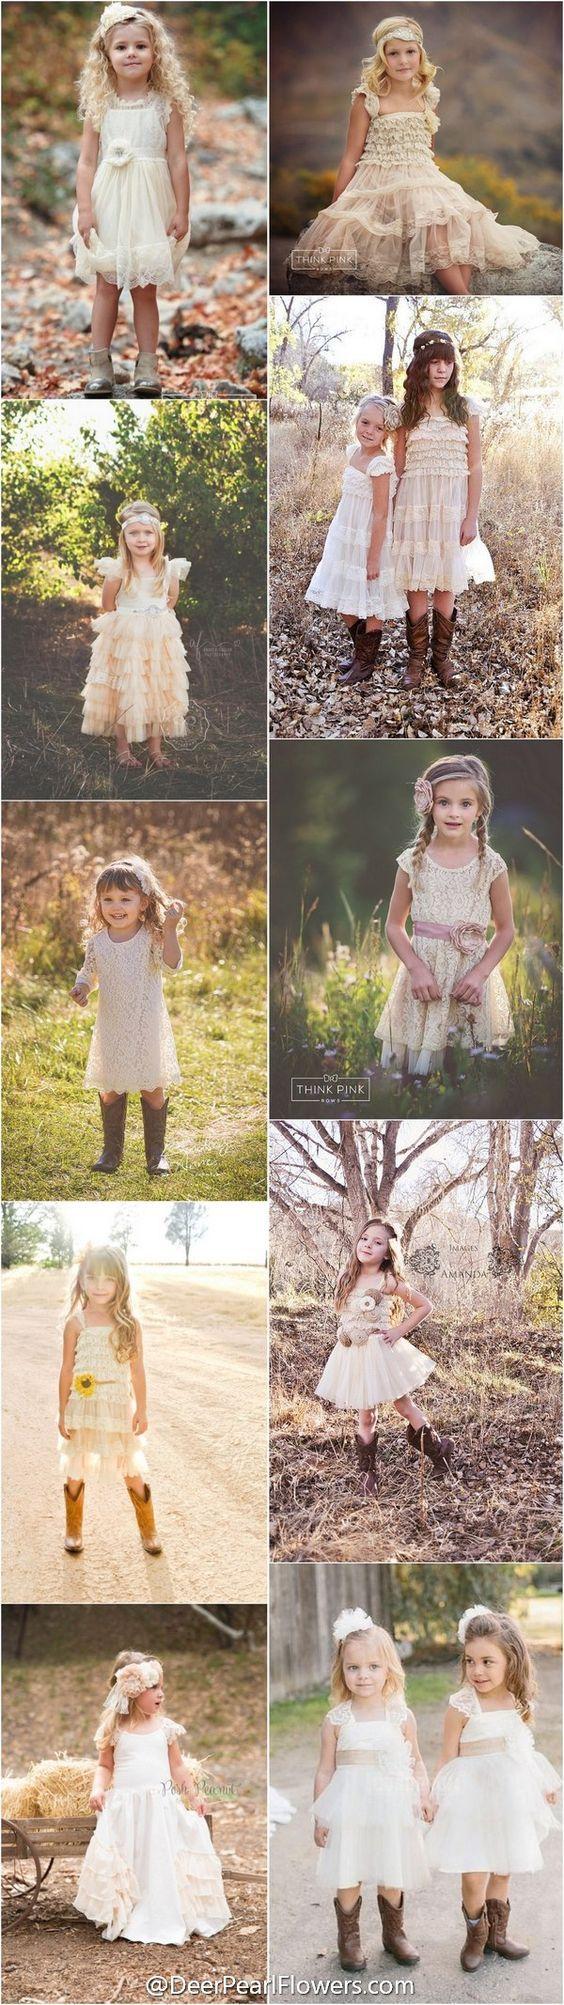 rustic country wedding ideas -  flower girl dresses / http://www.deerpearlflowers.com/flower-girl-dresses-for-country-weddings/